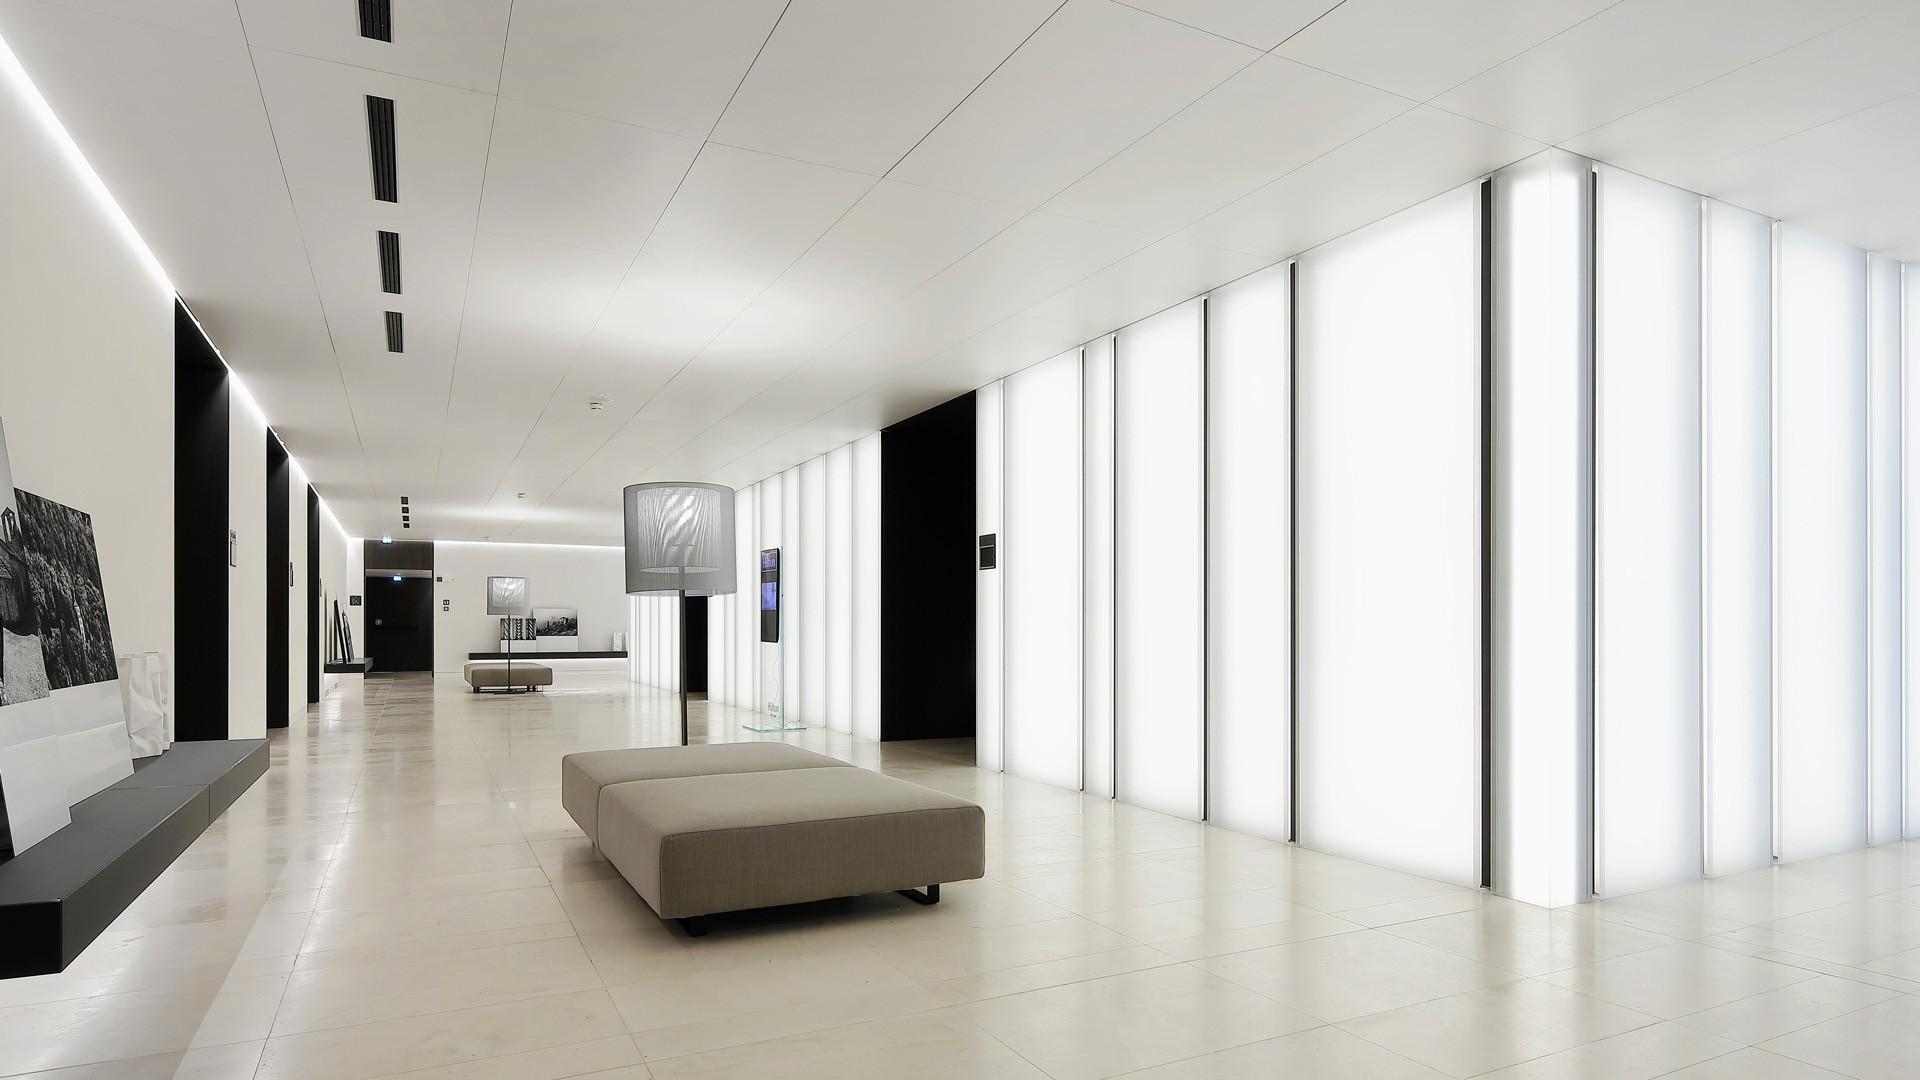 Poliform_contract_hospitality_HILTON_LAKECOMO_06_1920x1080px_gallery